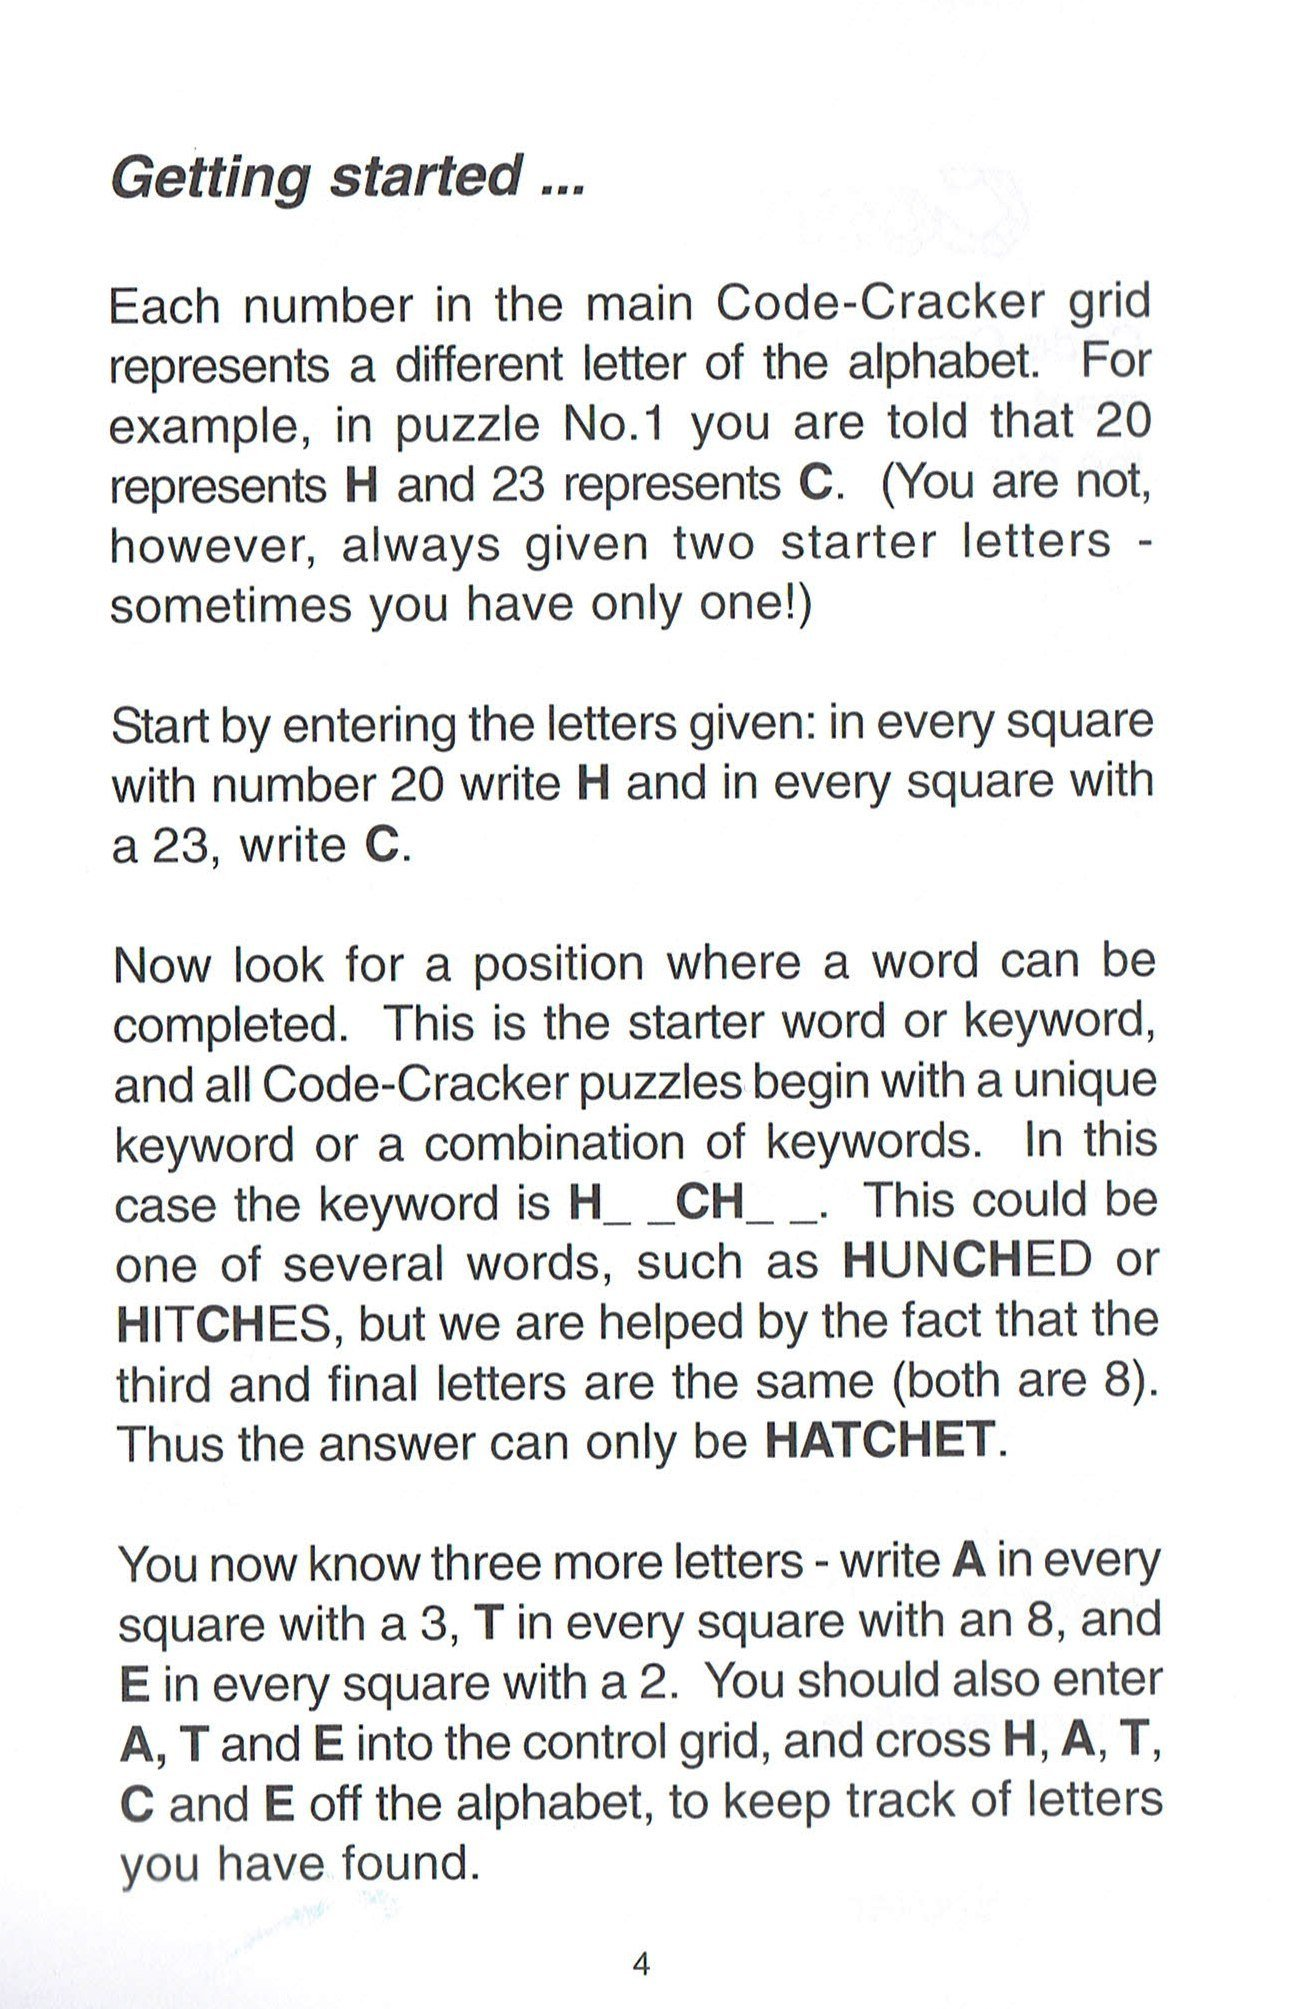 photo regarding Printable Code Cracker Puzzles identify Simon Shukers Code-Cracker - Amount Just one: Simon Shuker